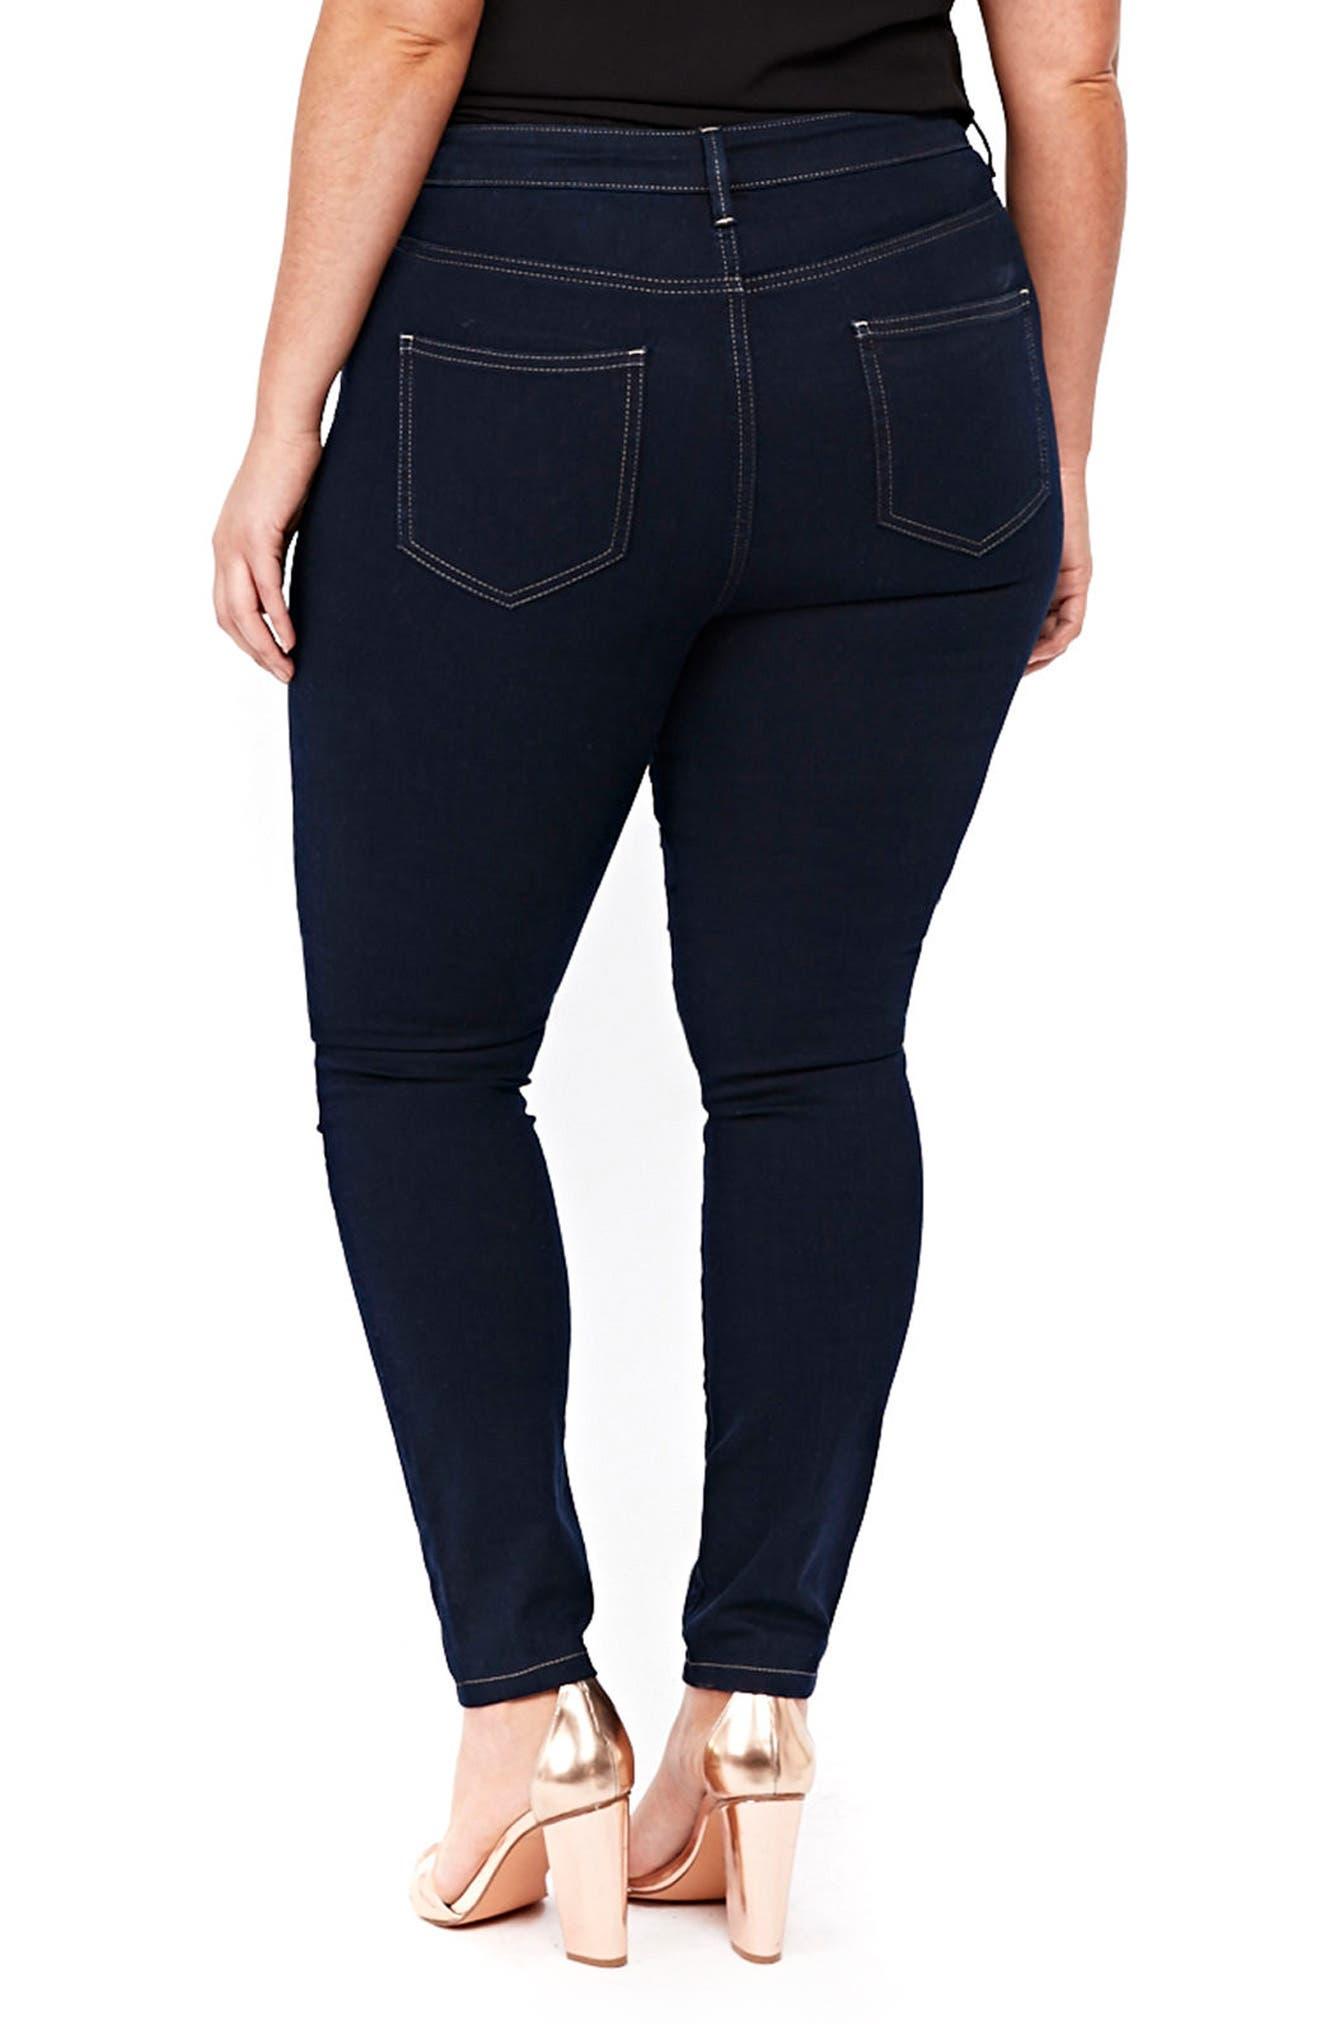 Pintuck High Waist Skinny Jeans,                             Alternate thumbnail 3, color,                             Indigo